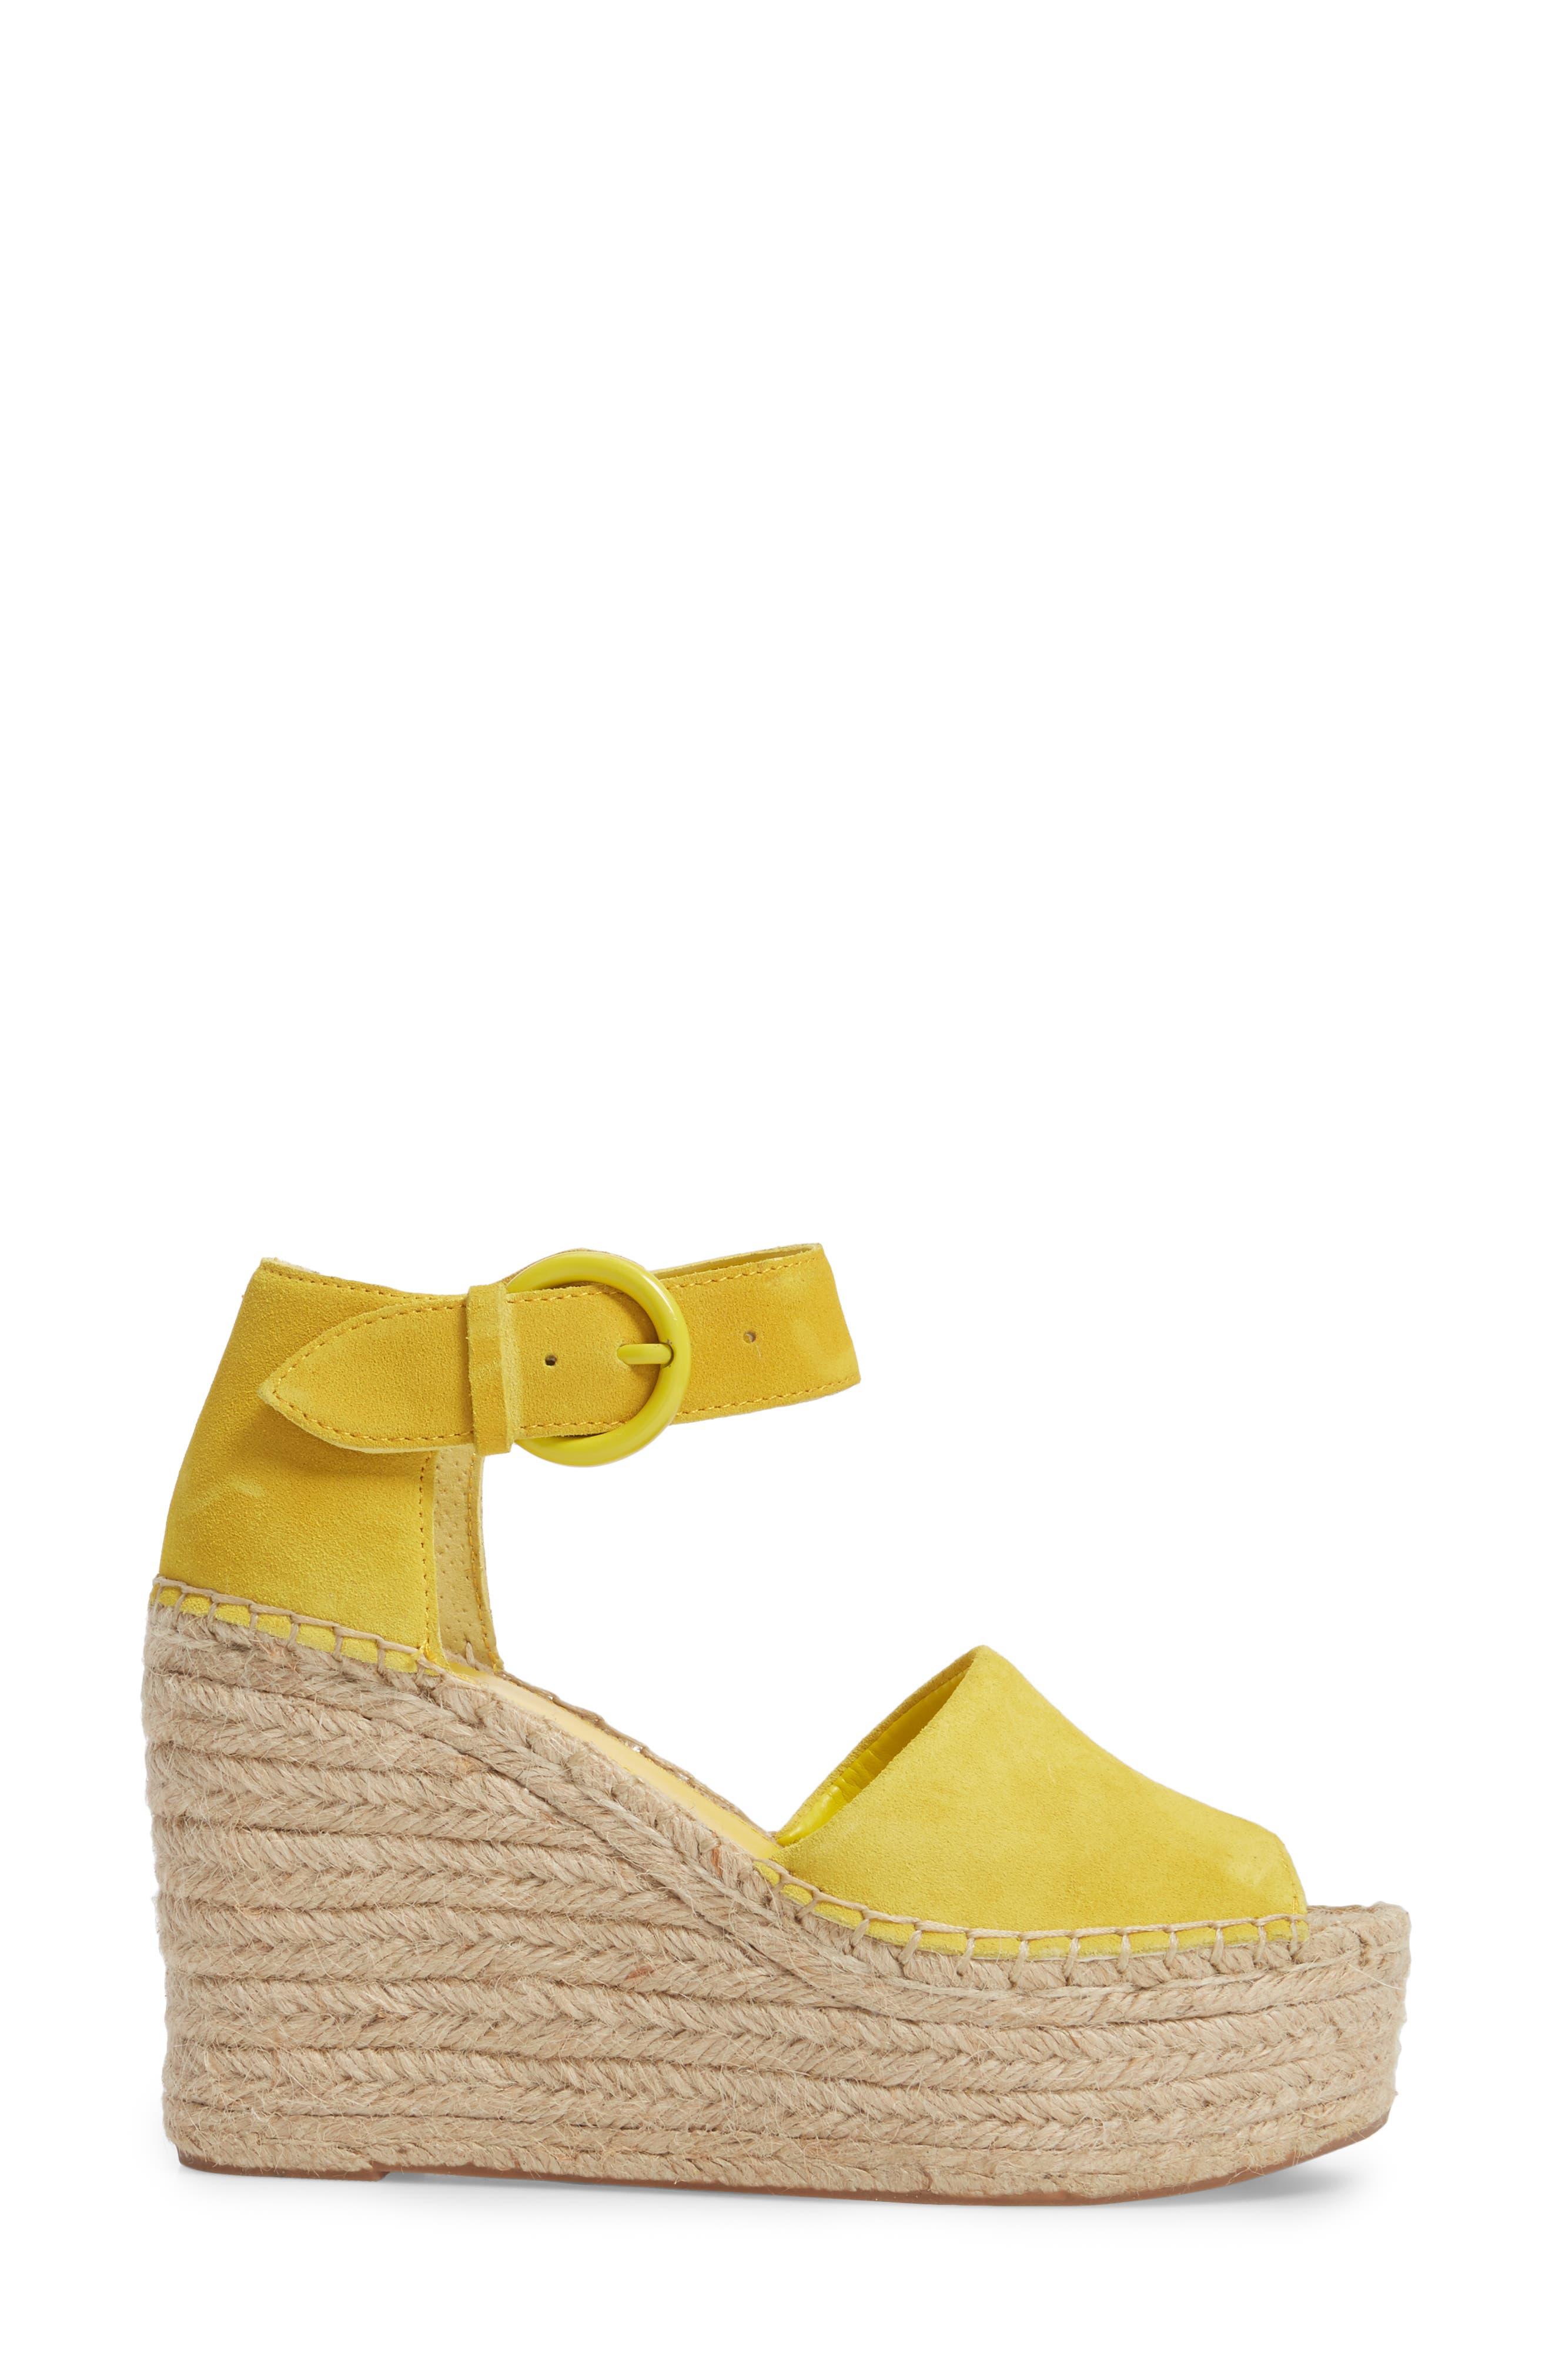 Alida Espadrille Platform Wedge,                             Alternate thumbnail 3, color,                             Yellow Suede